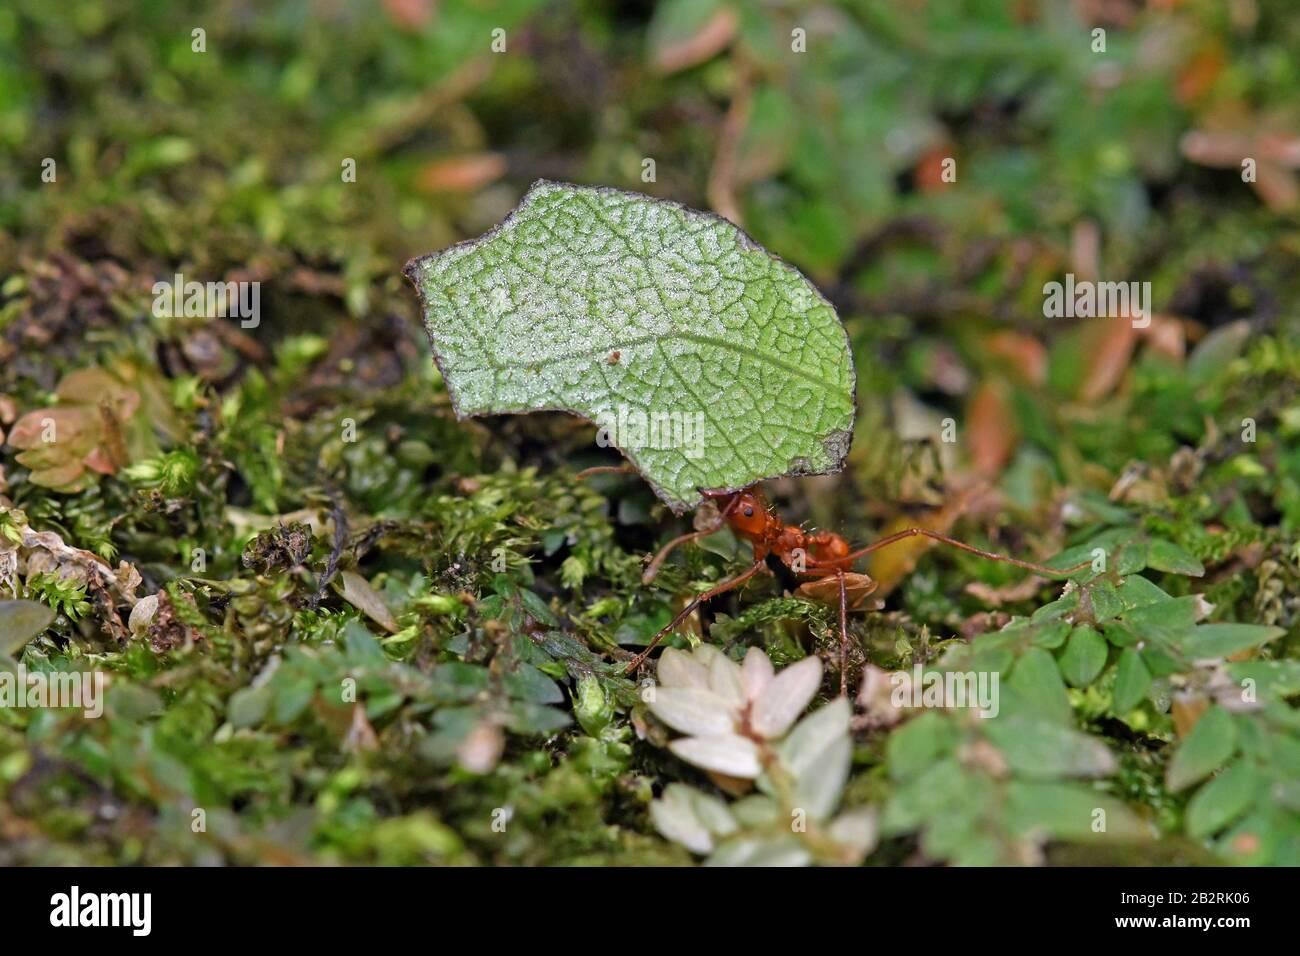 Leaf cutting ant, Costa Rica Stock Photo